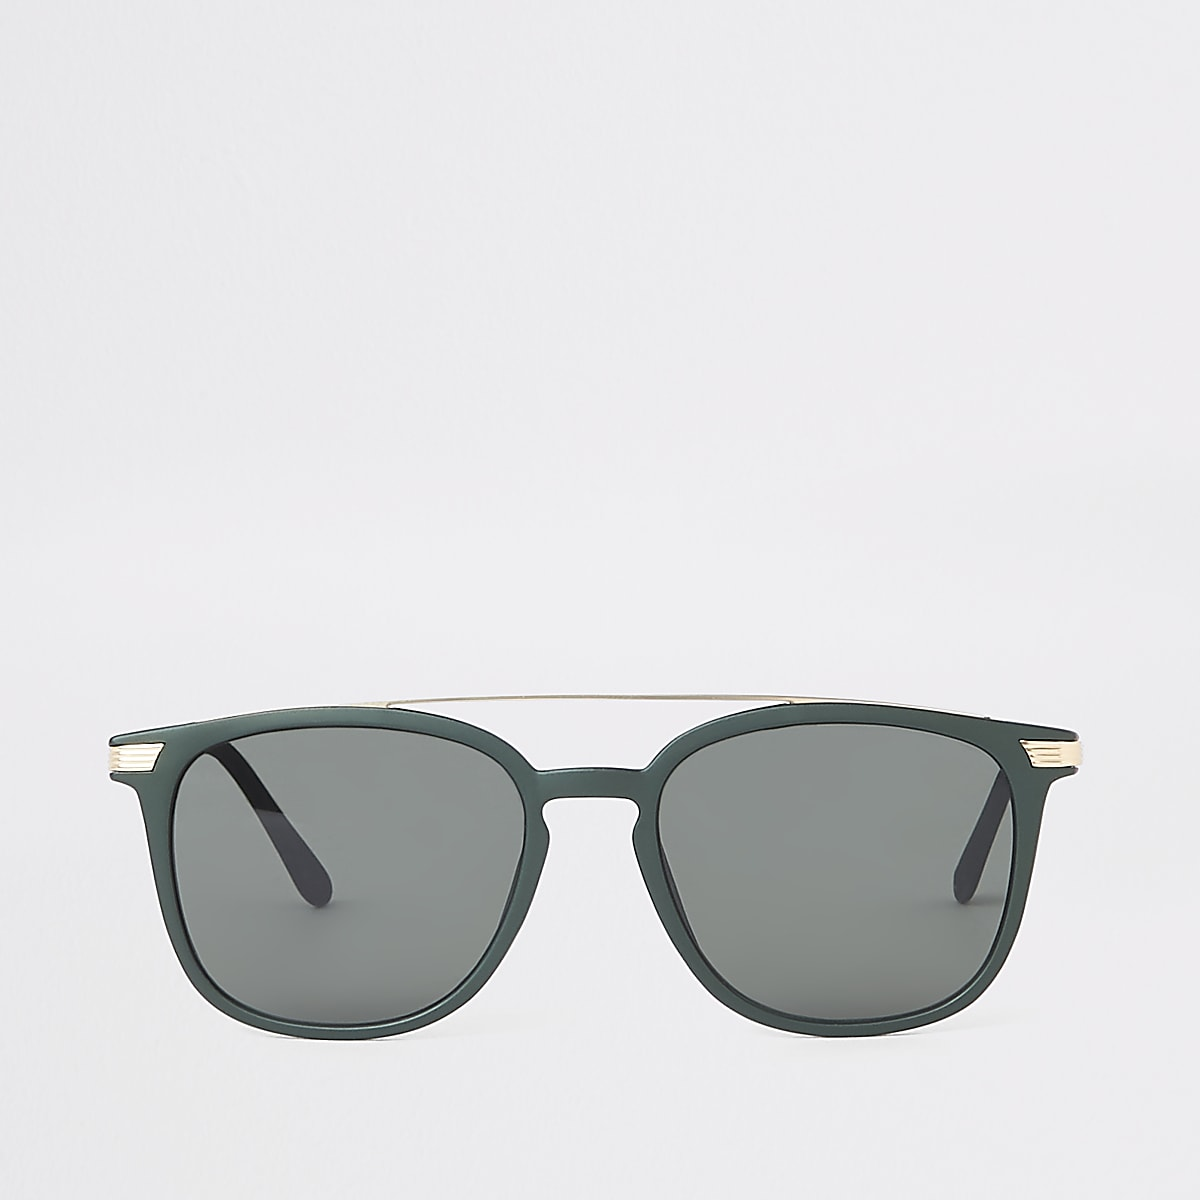 Khaki green brow bar navigator sunglasses